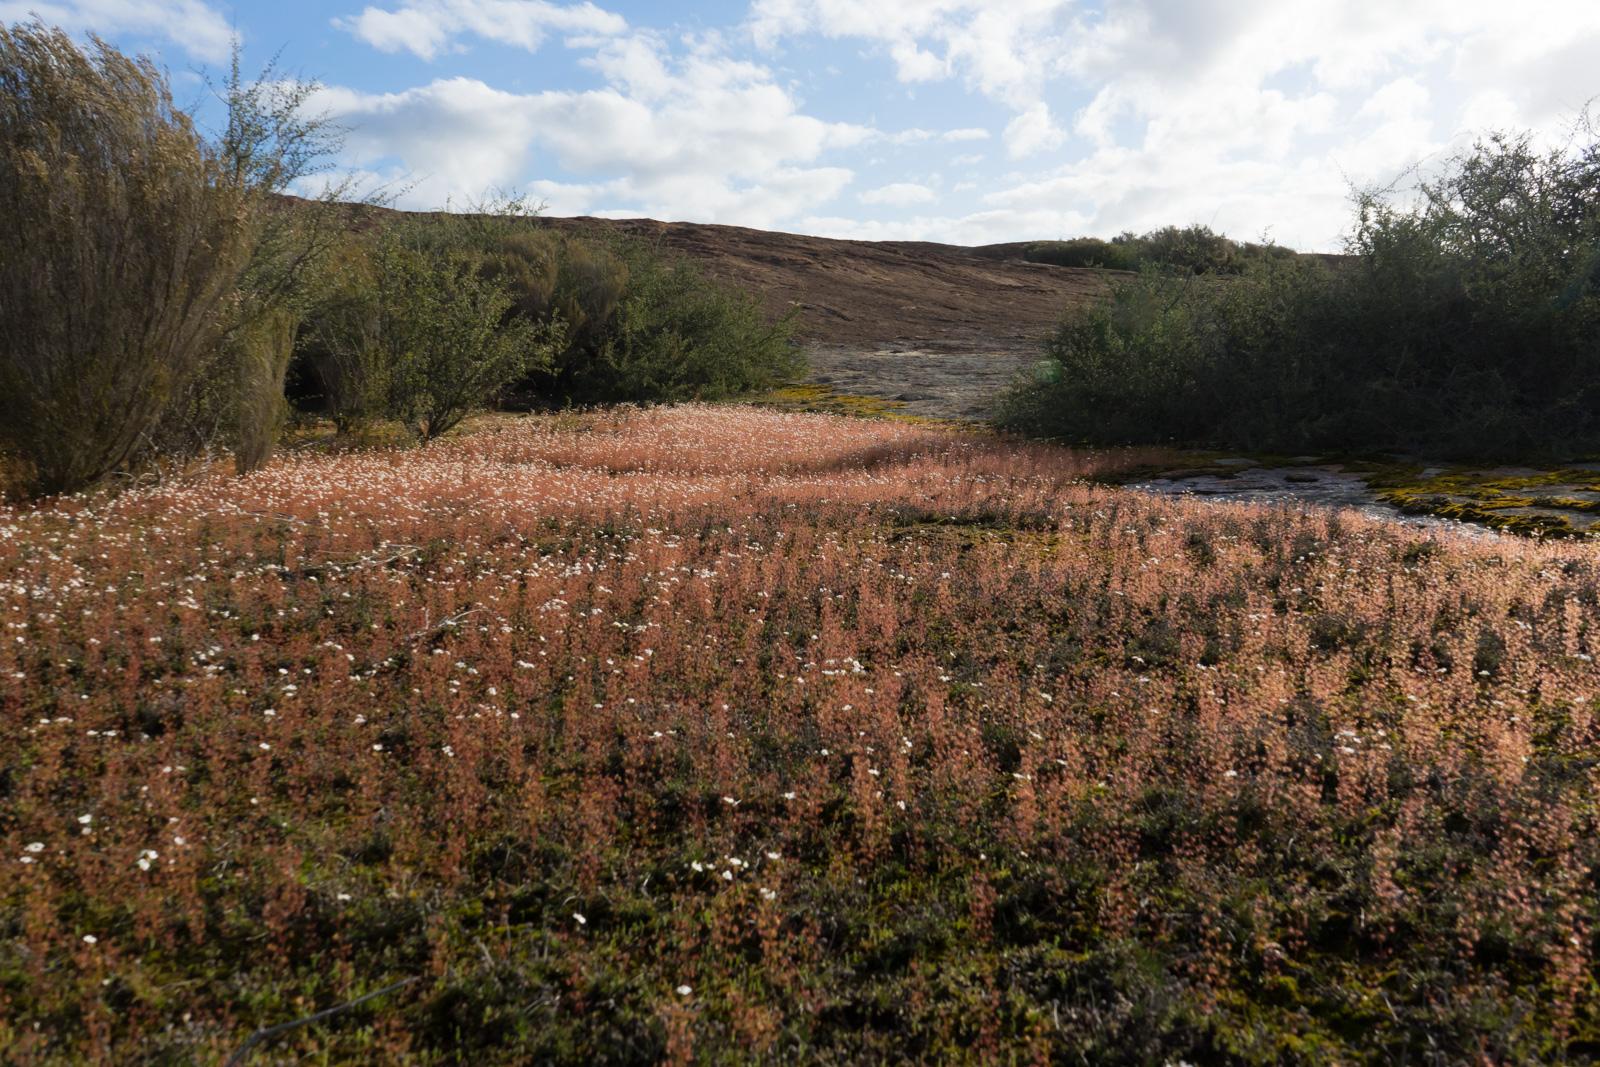 Carnivorous plants of the Western Australian granite outcrops